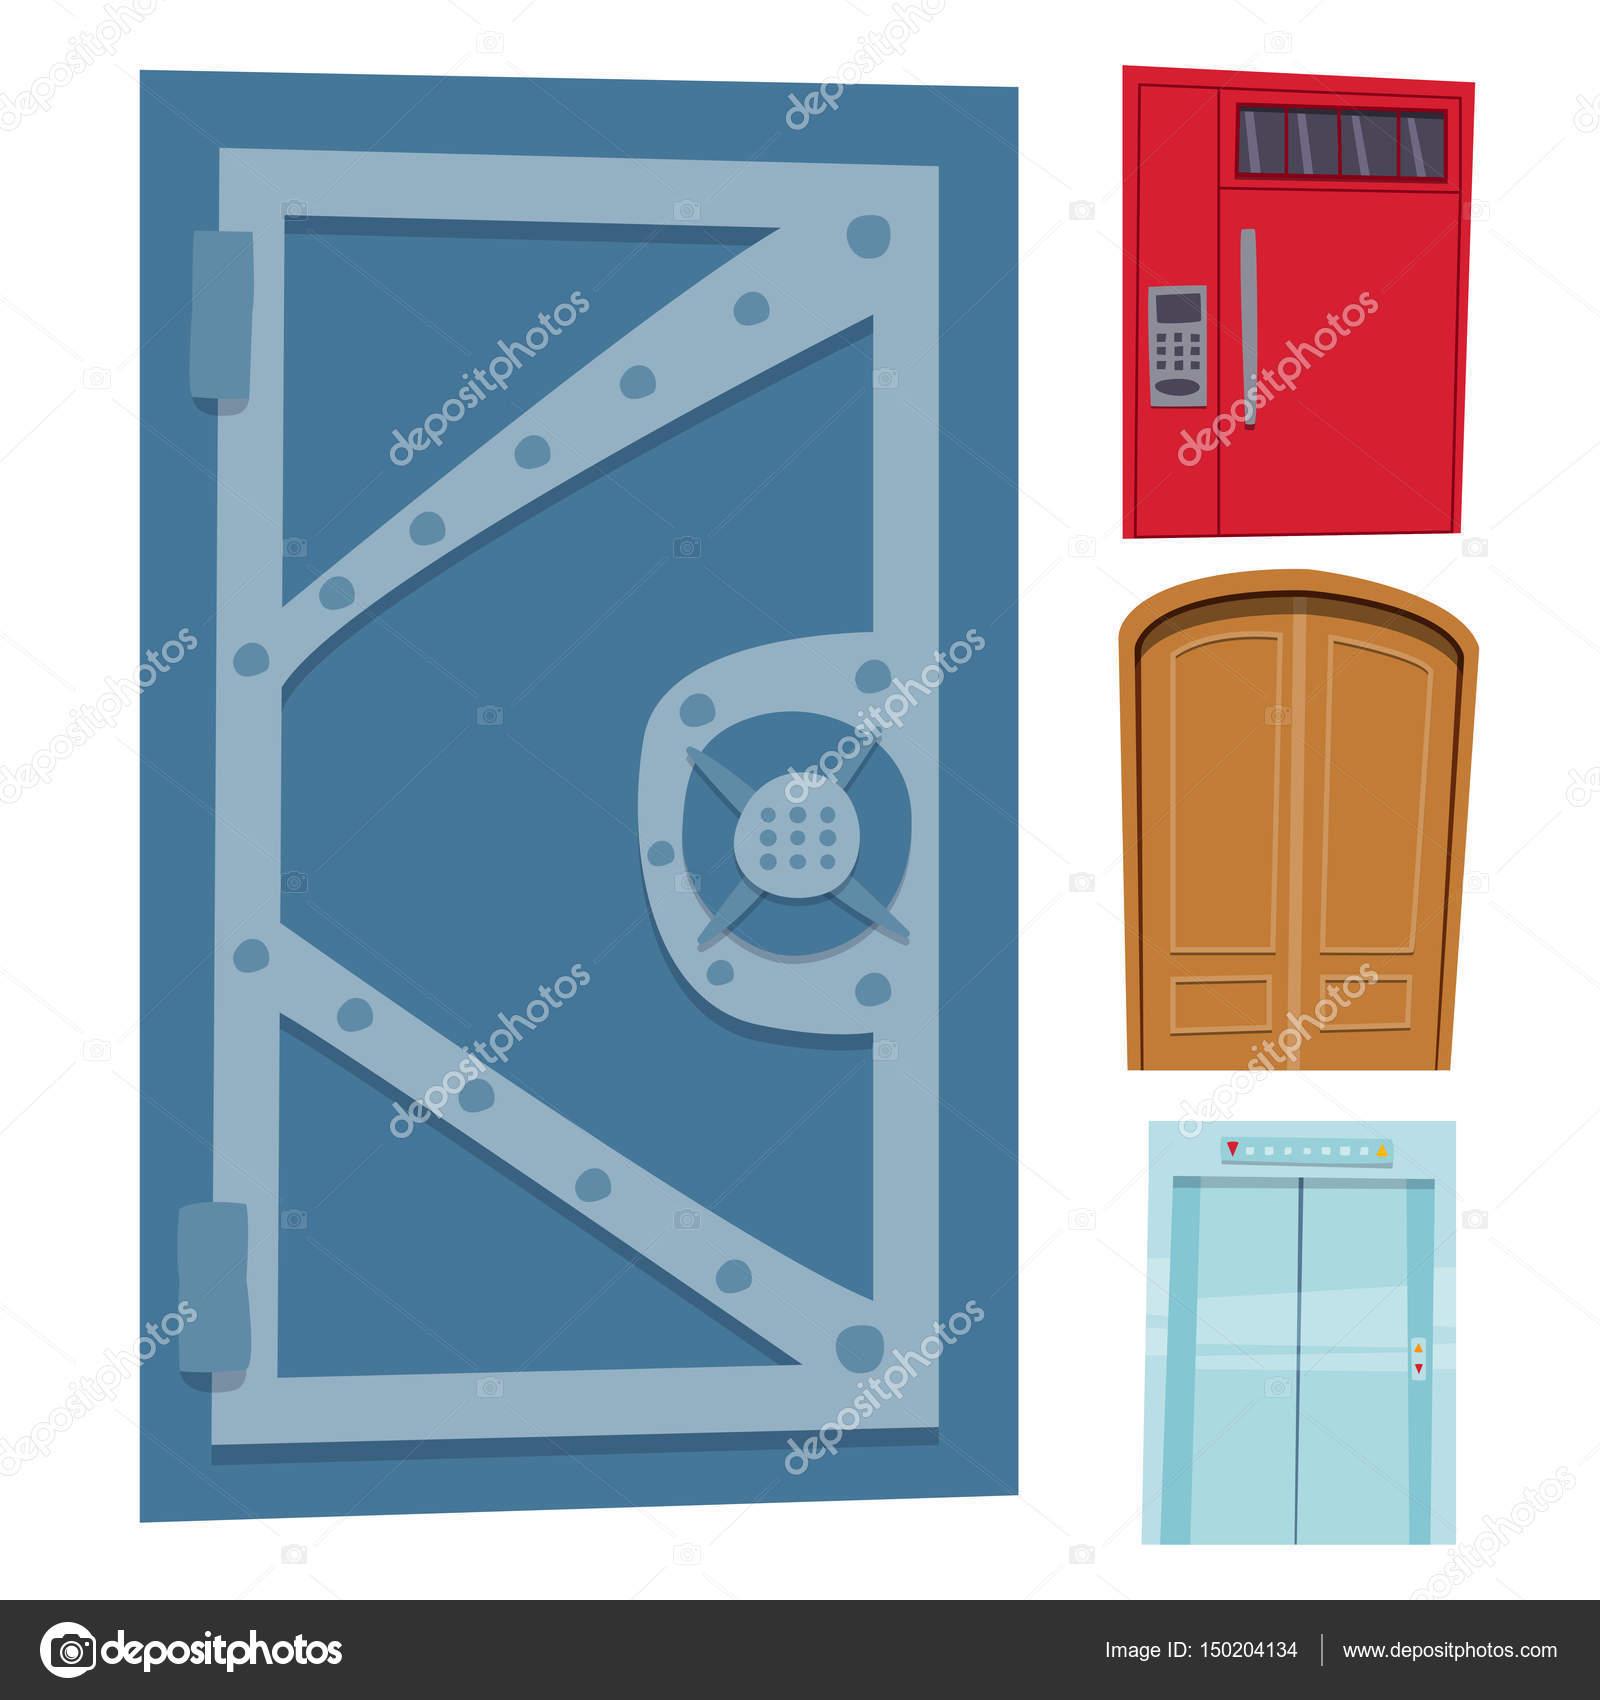 open front door illustration door clipart color door front to house and building flat design style isolated vector illustration modern new decoration open elegant room lock